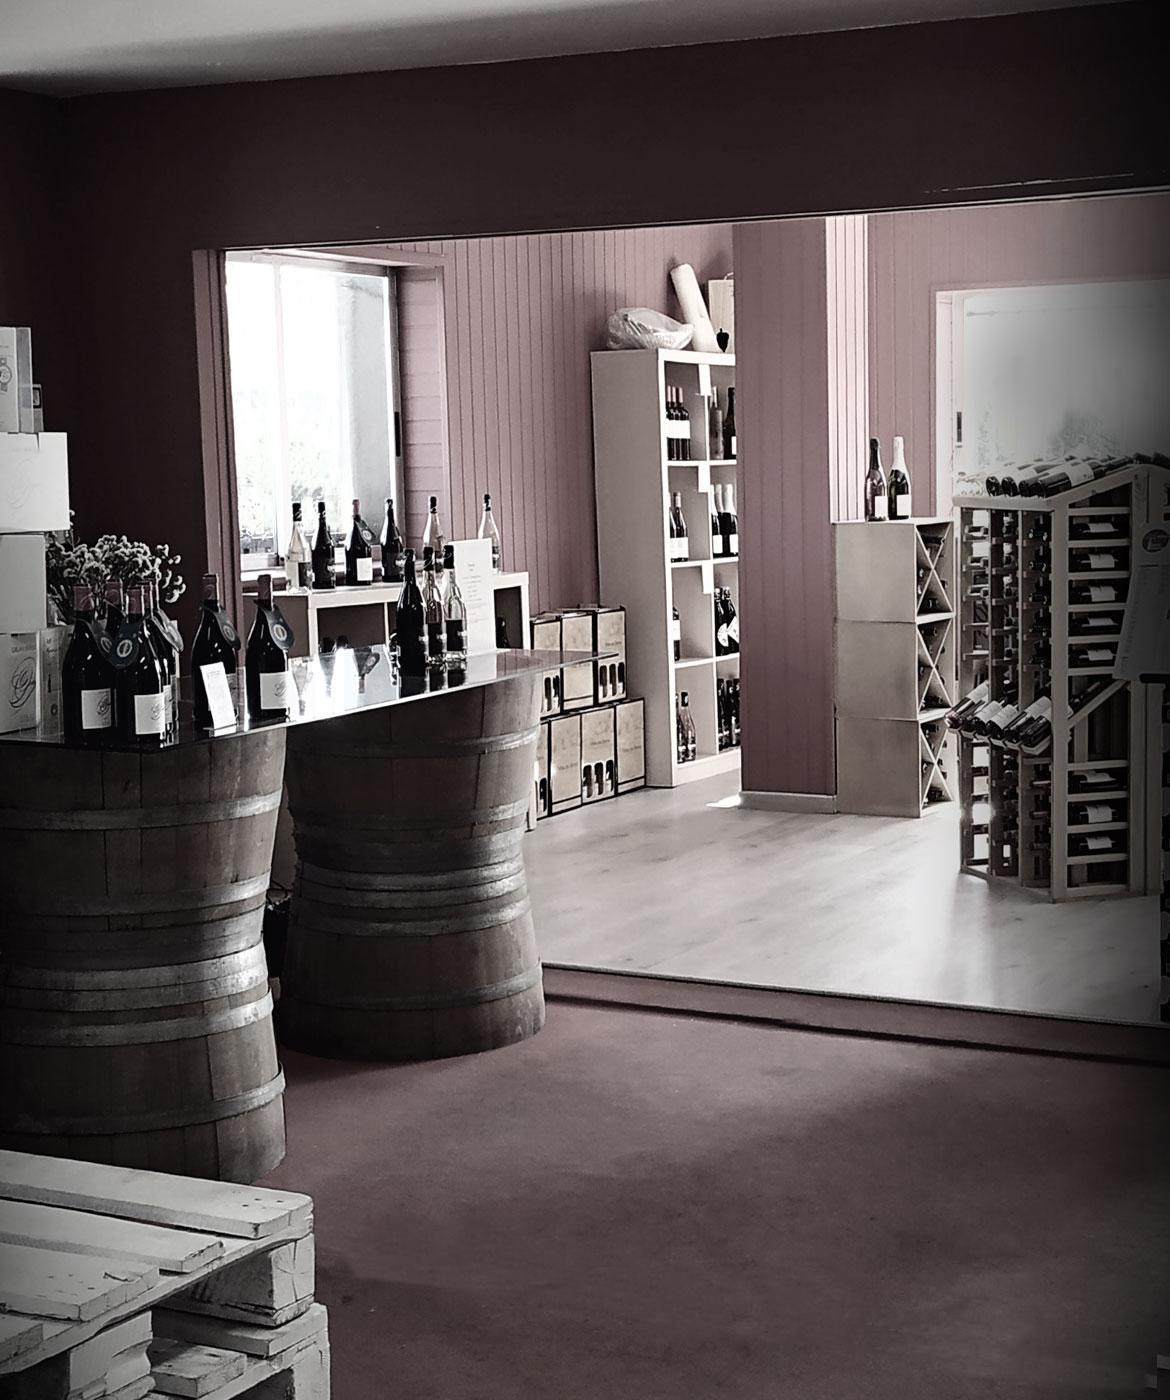 Tienda vinos Gran Bierzo